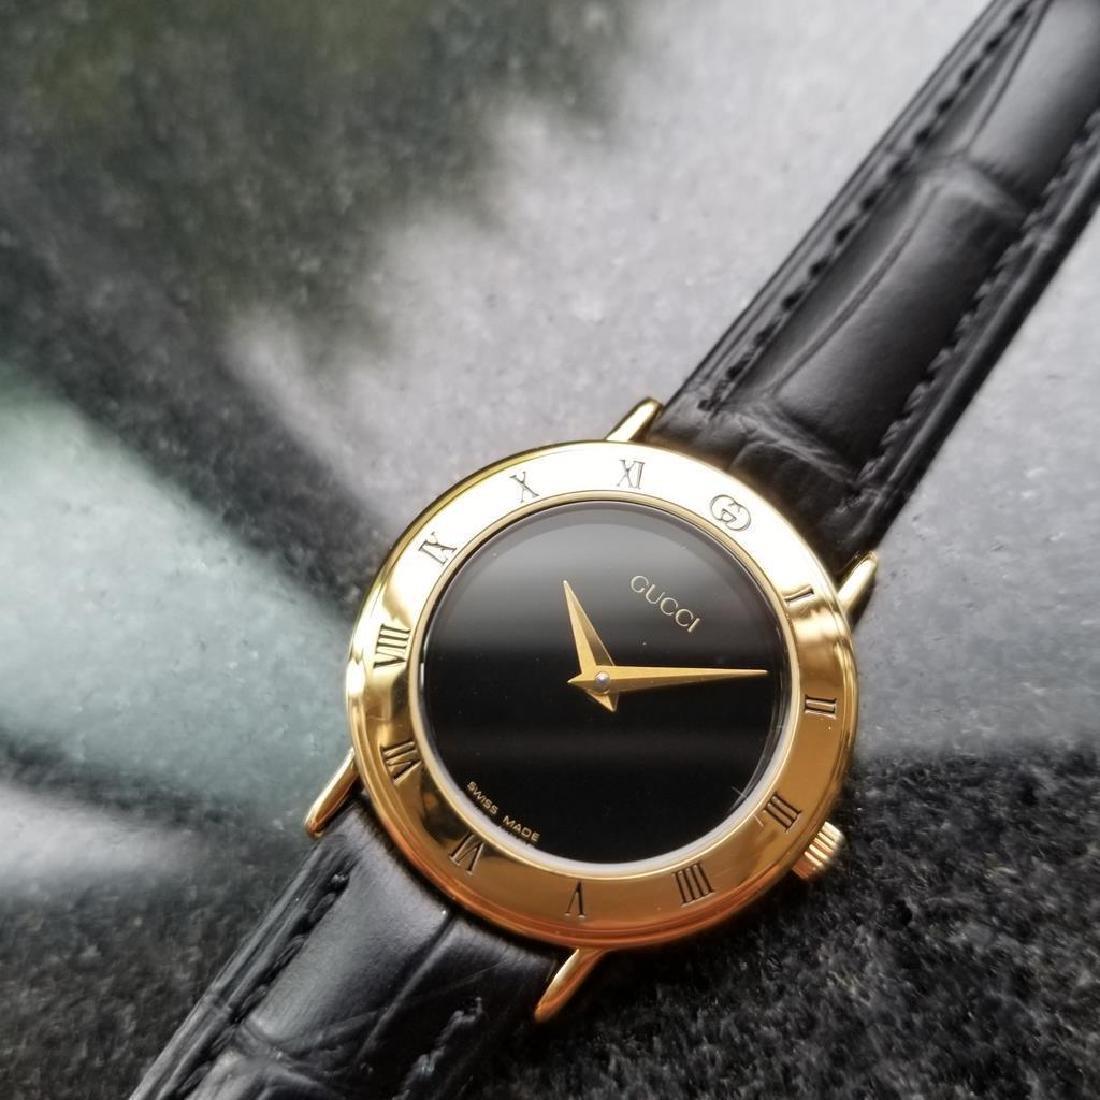 GUCCI Ladies Gold-Plated 3000.2.L Lux Swiss Dress Watch